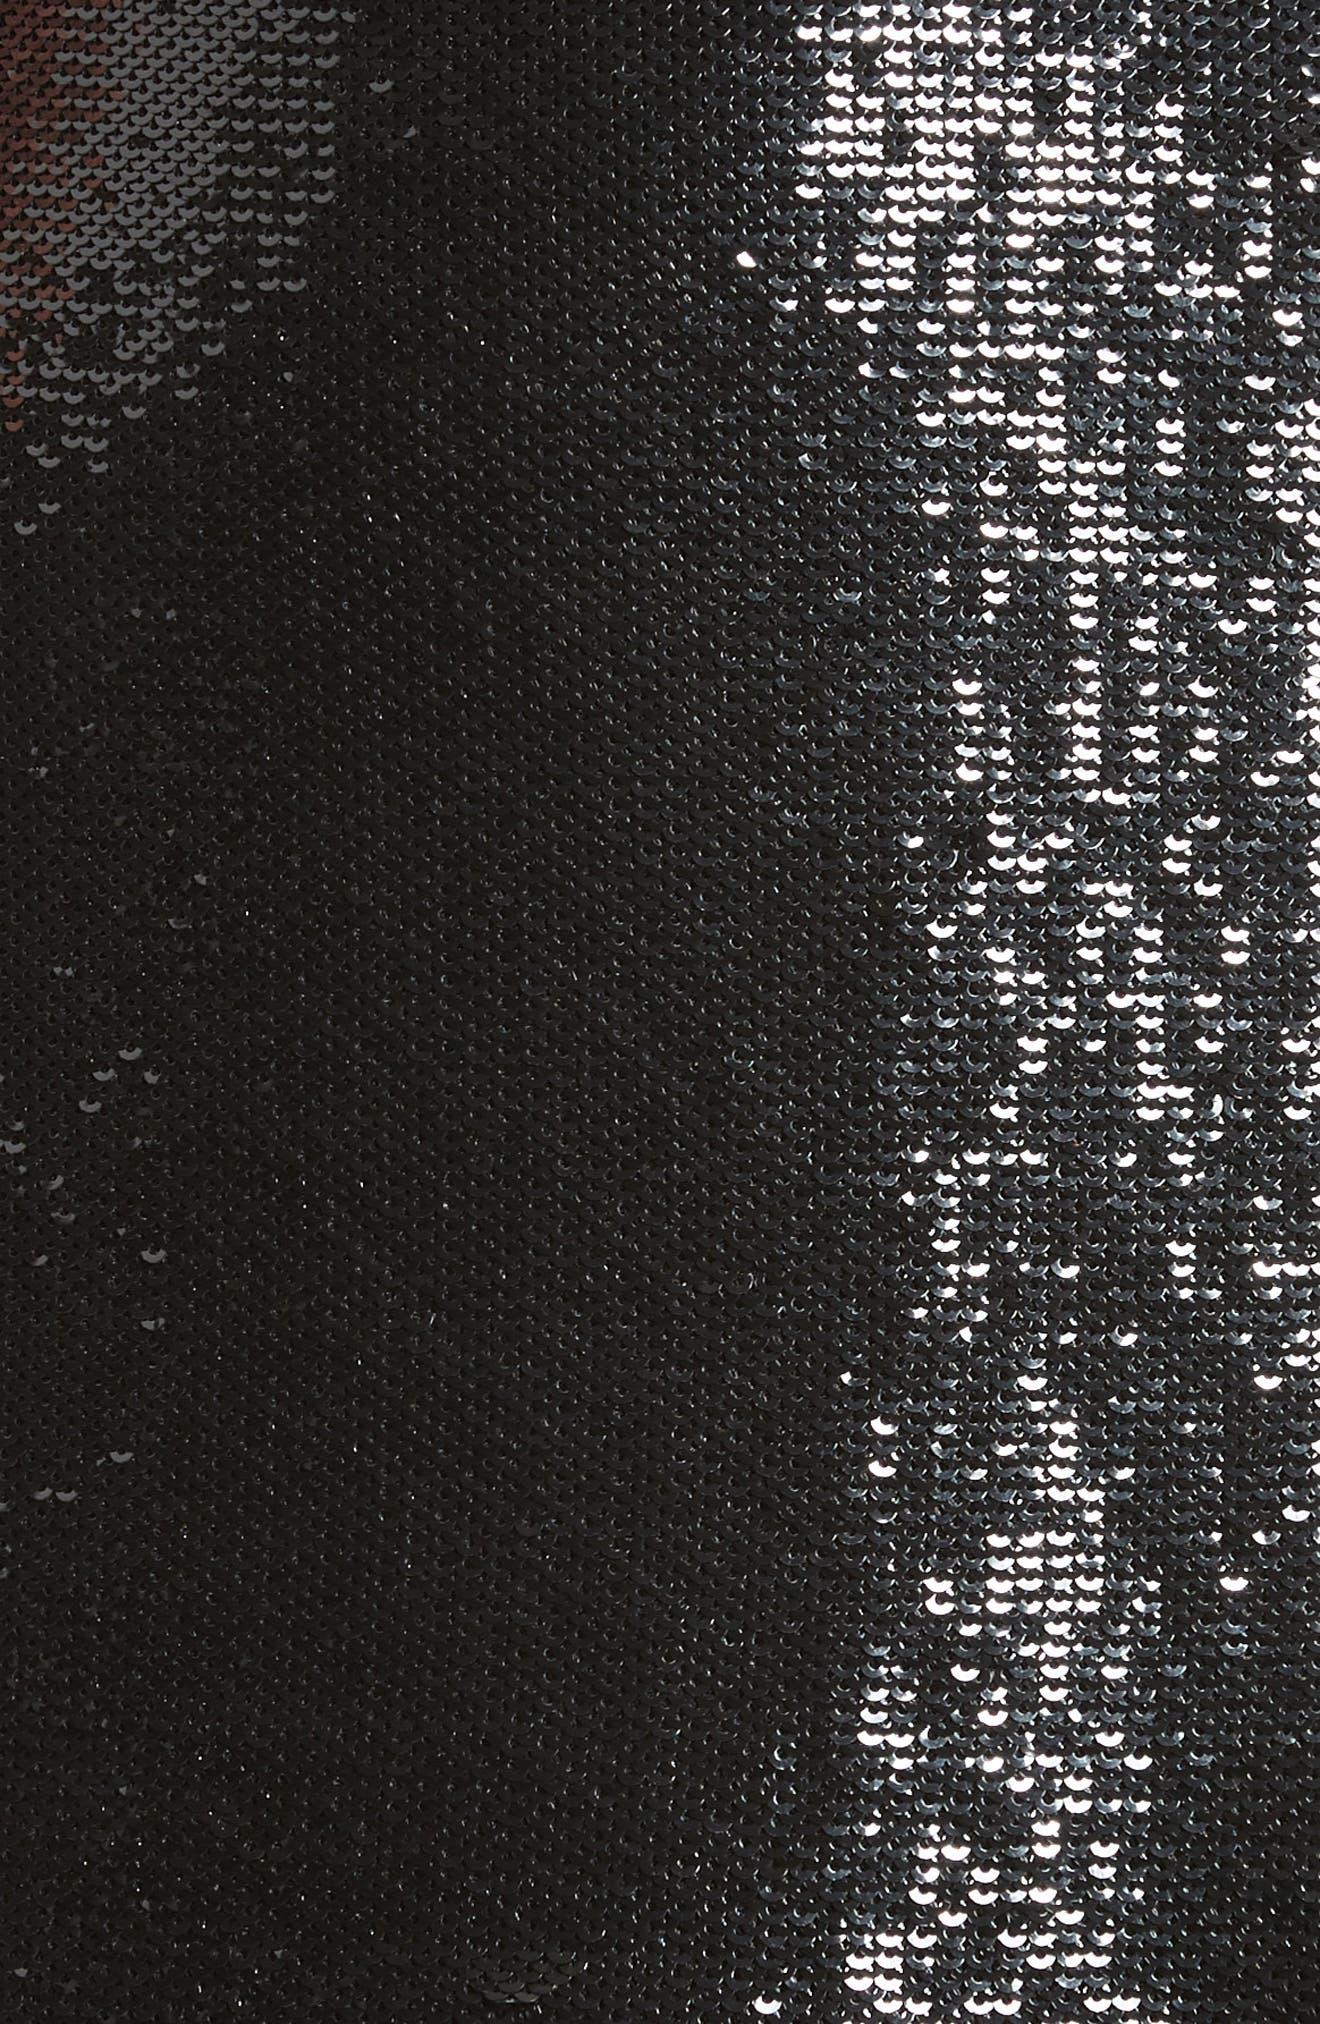 Diane von Furstenberg Sequin Pencil Skirt,                             Alternate thumbnail 5, color,                             001